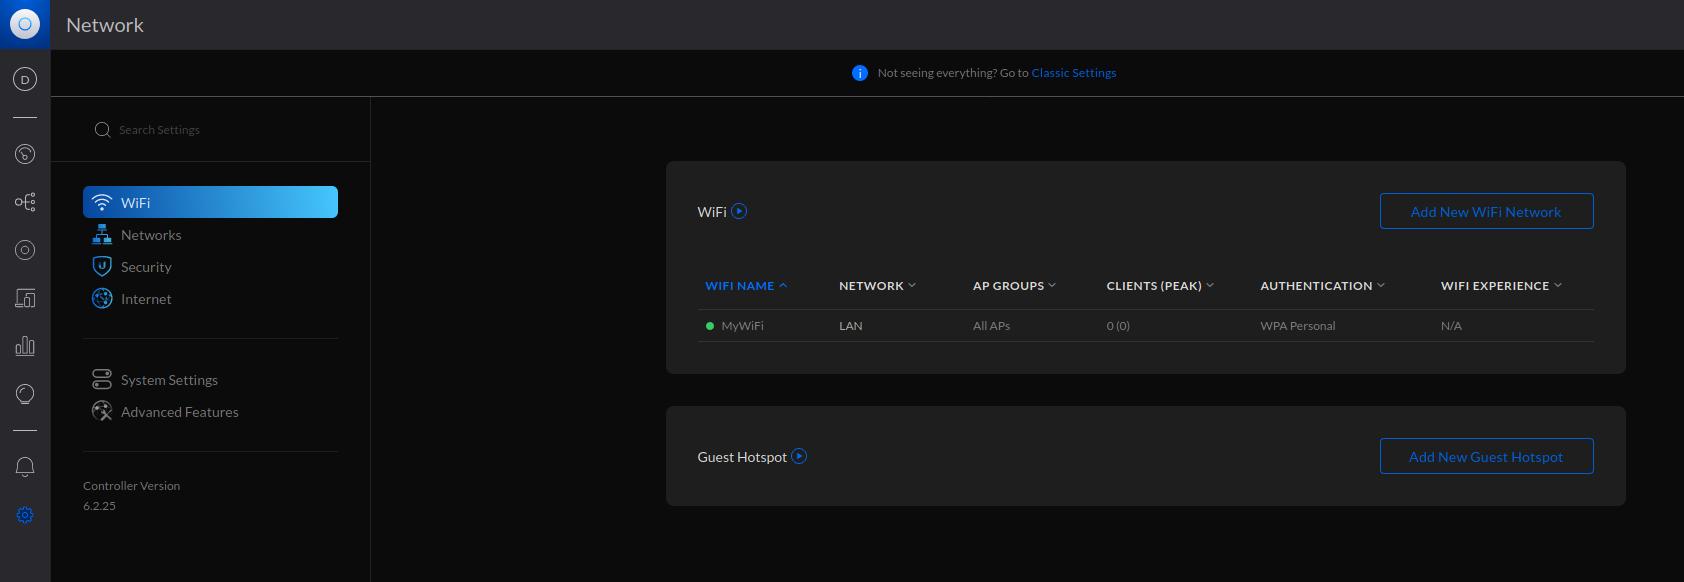 Header image. UniFi settings page